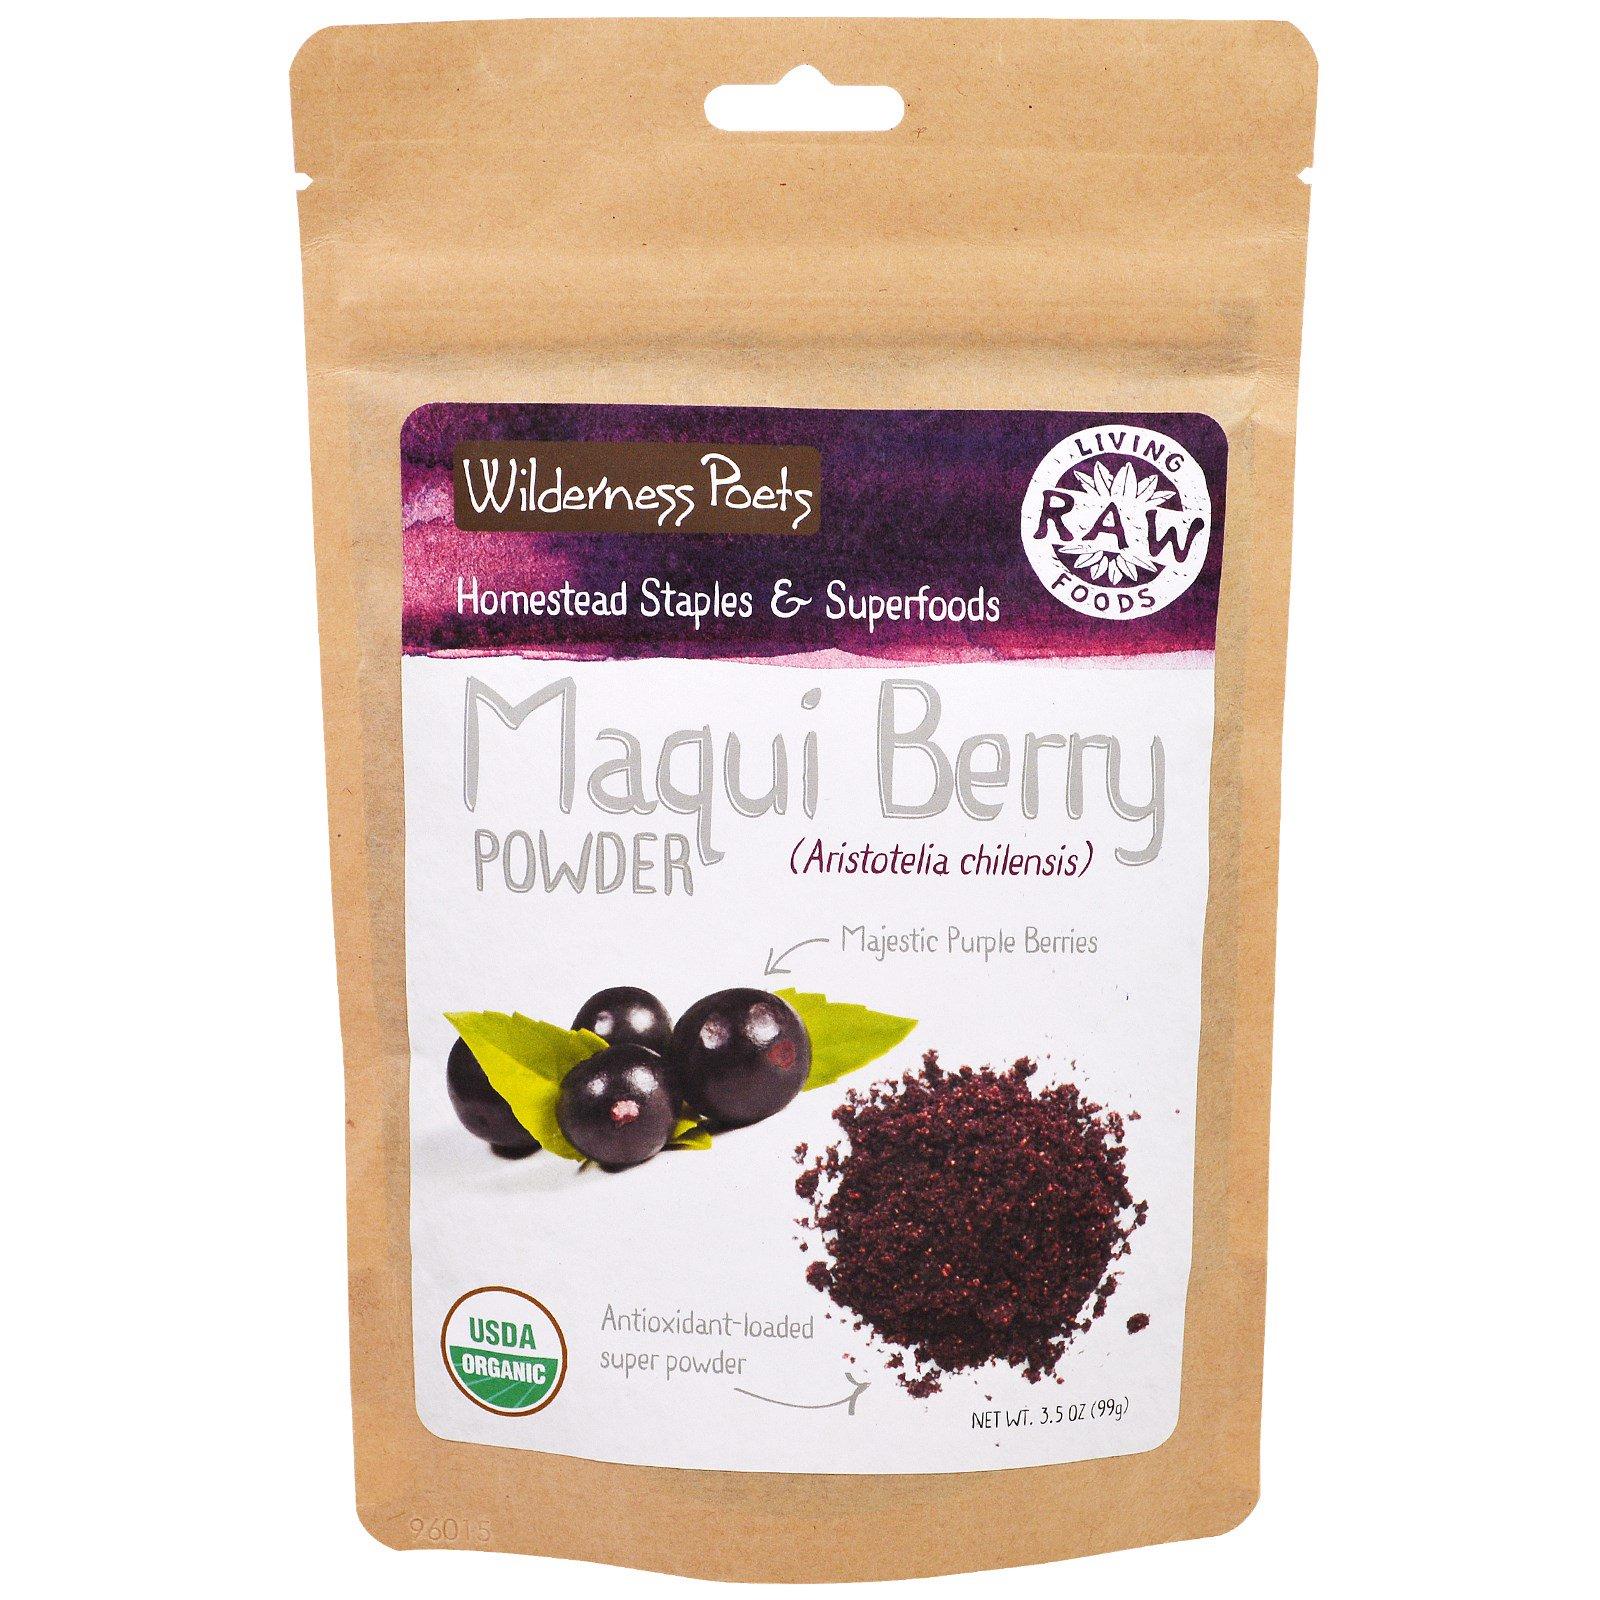 Wilderness Poets Living Raw Foods Maqui Berry Powder 3 5 Oz 99